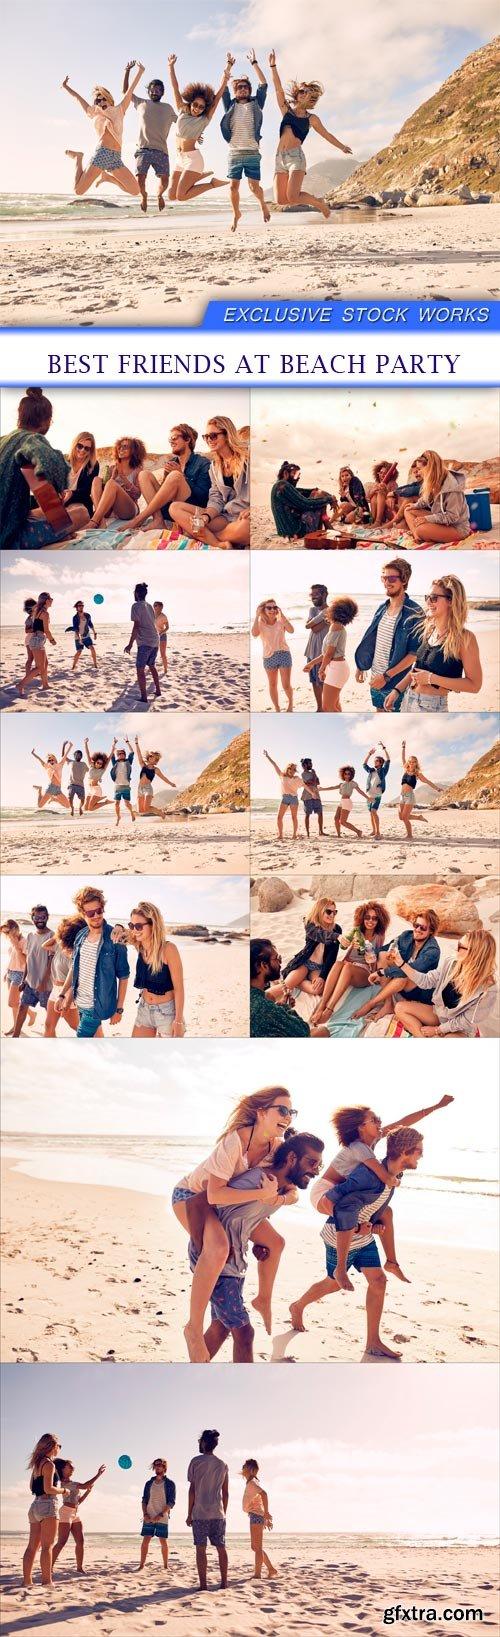 Best friends at beach party 10 JPEG